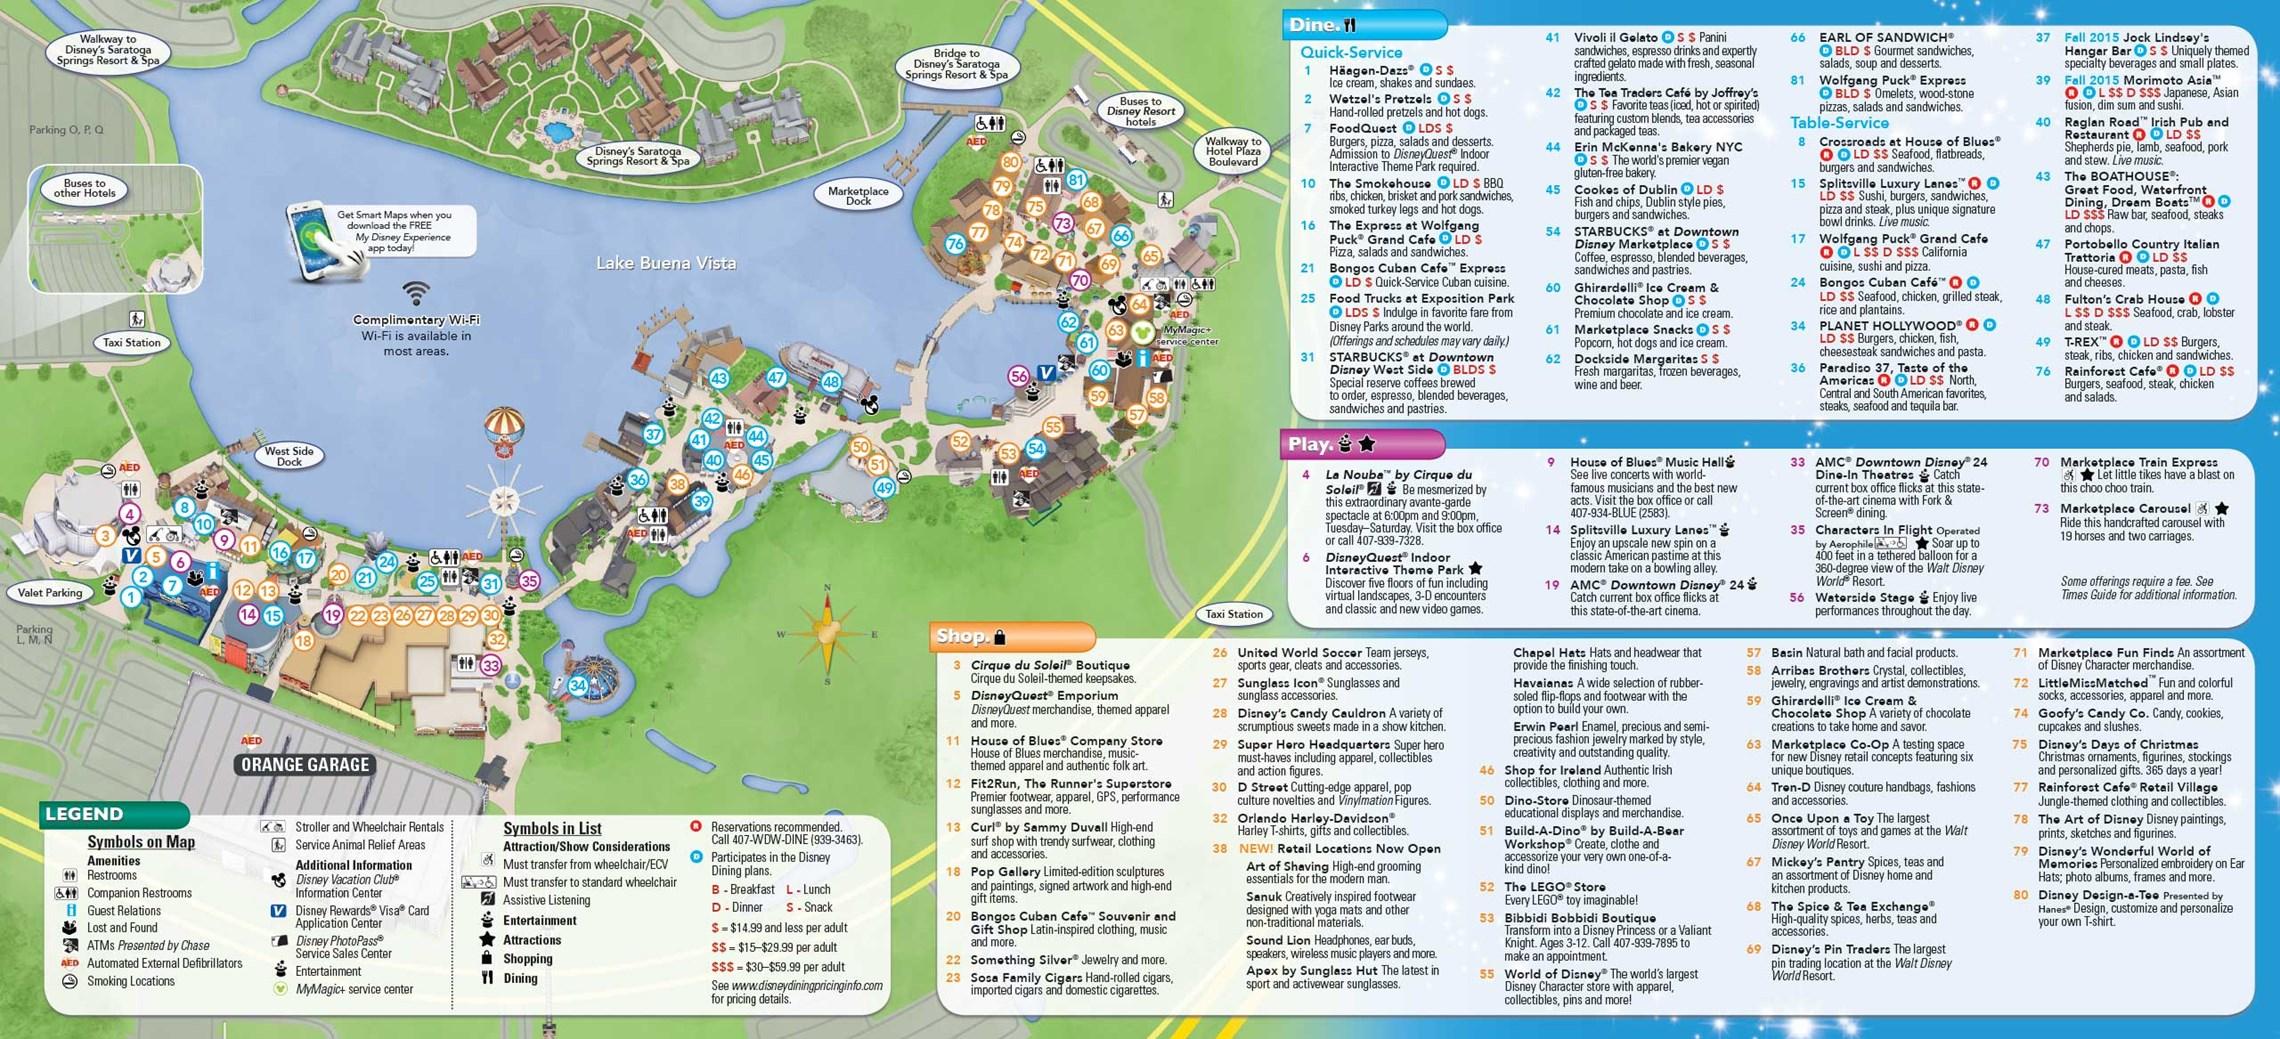 ... 03, 2015. Downtown Disney / Disney Springs August 2015 Guide Map